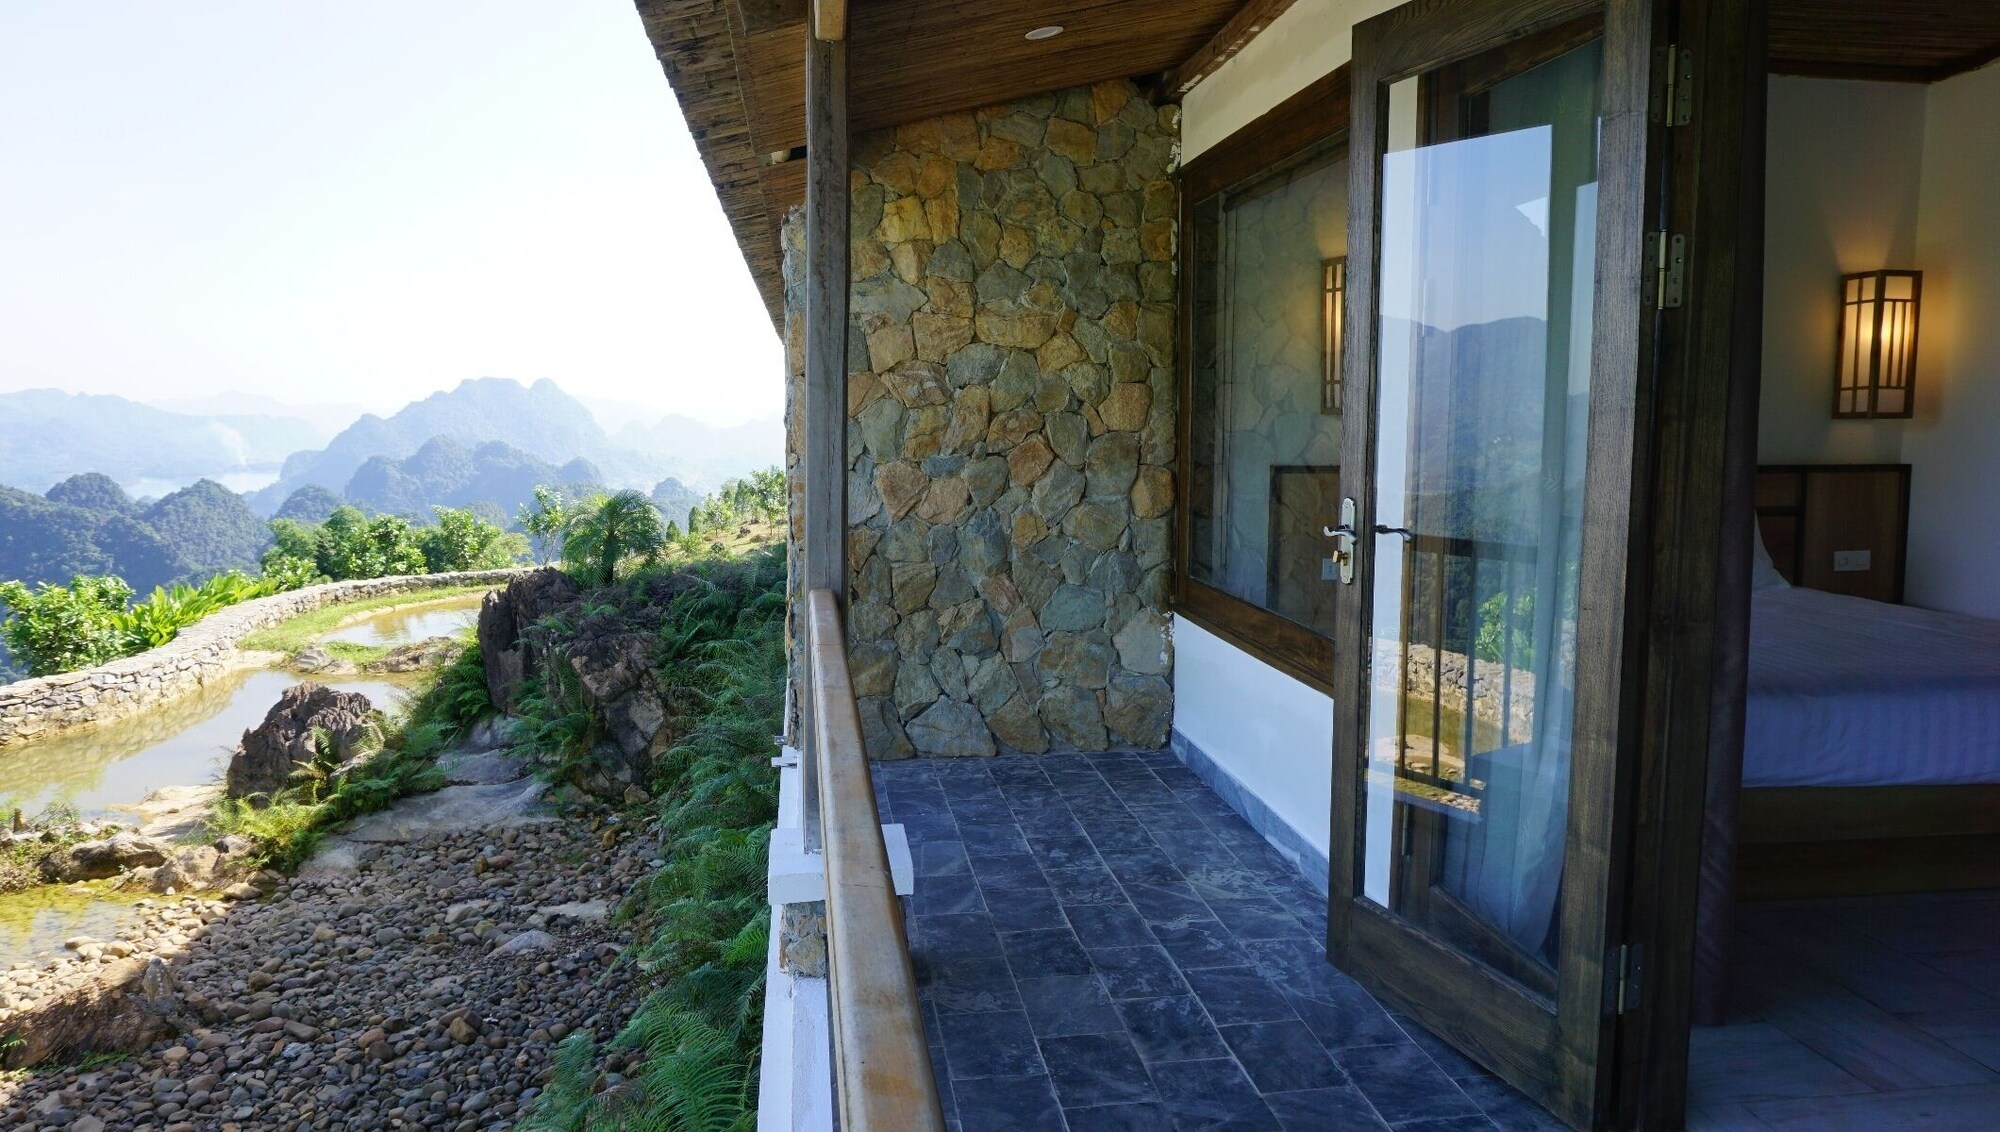 Ba Khan village resort, Mai Châu